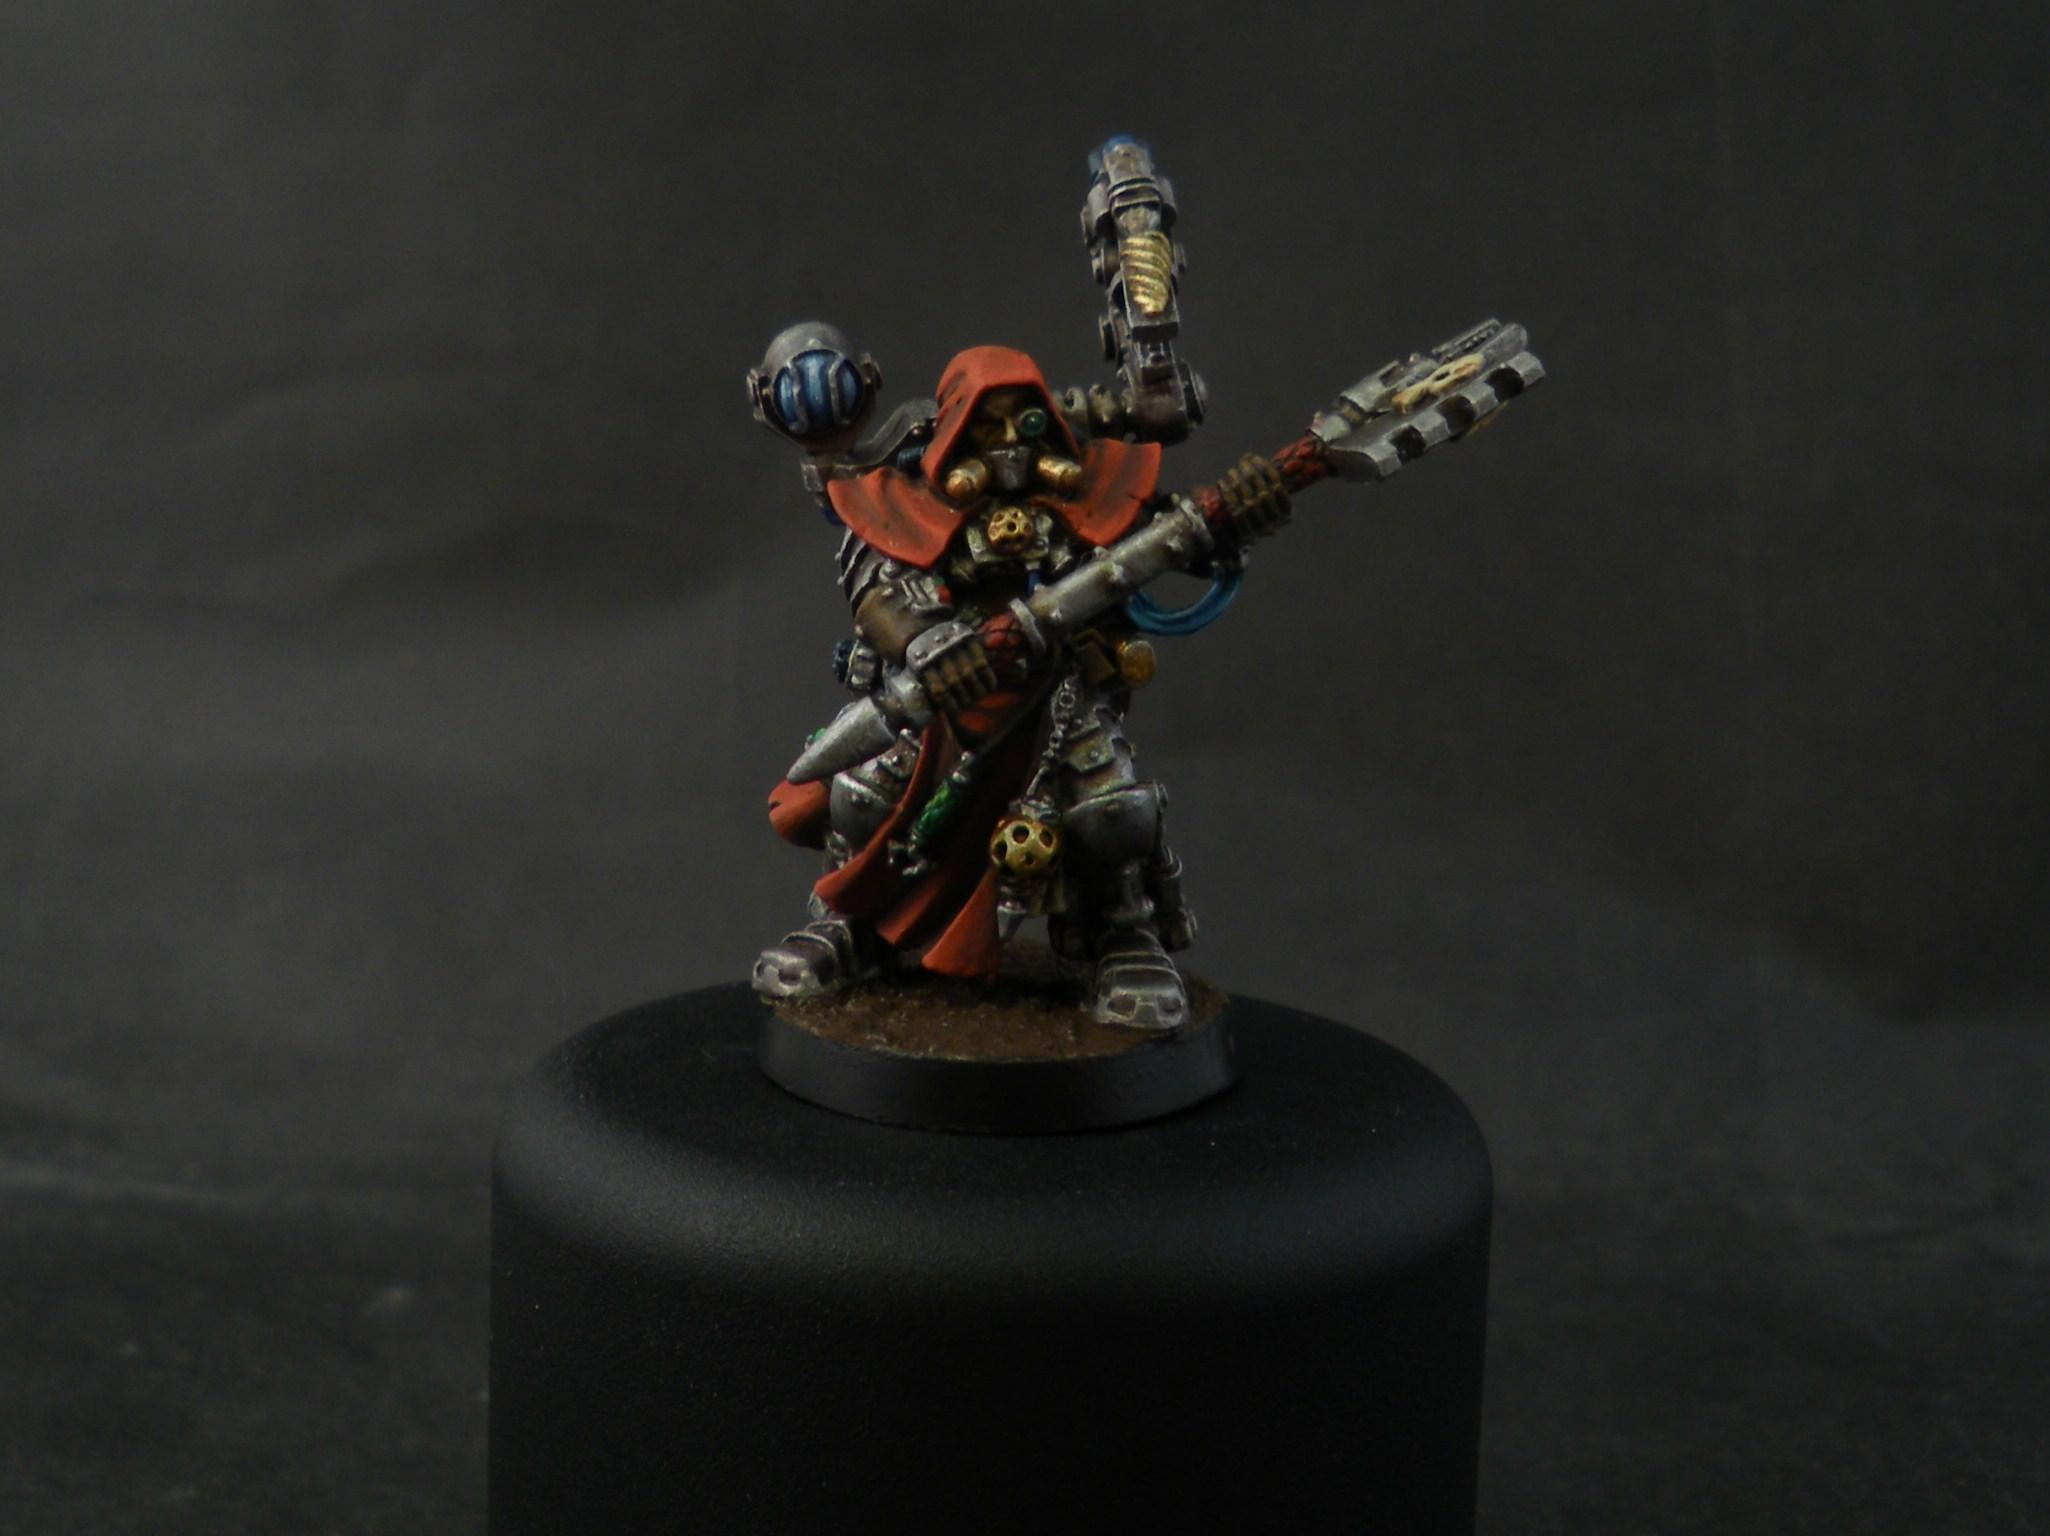 Adeptus Mechanicus, Techpriest, Warhammer 40,000